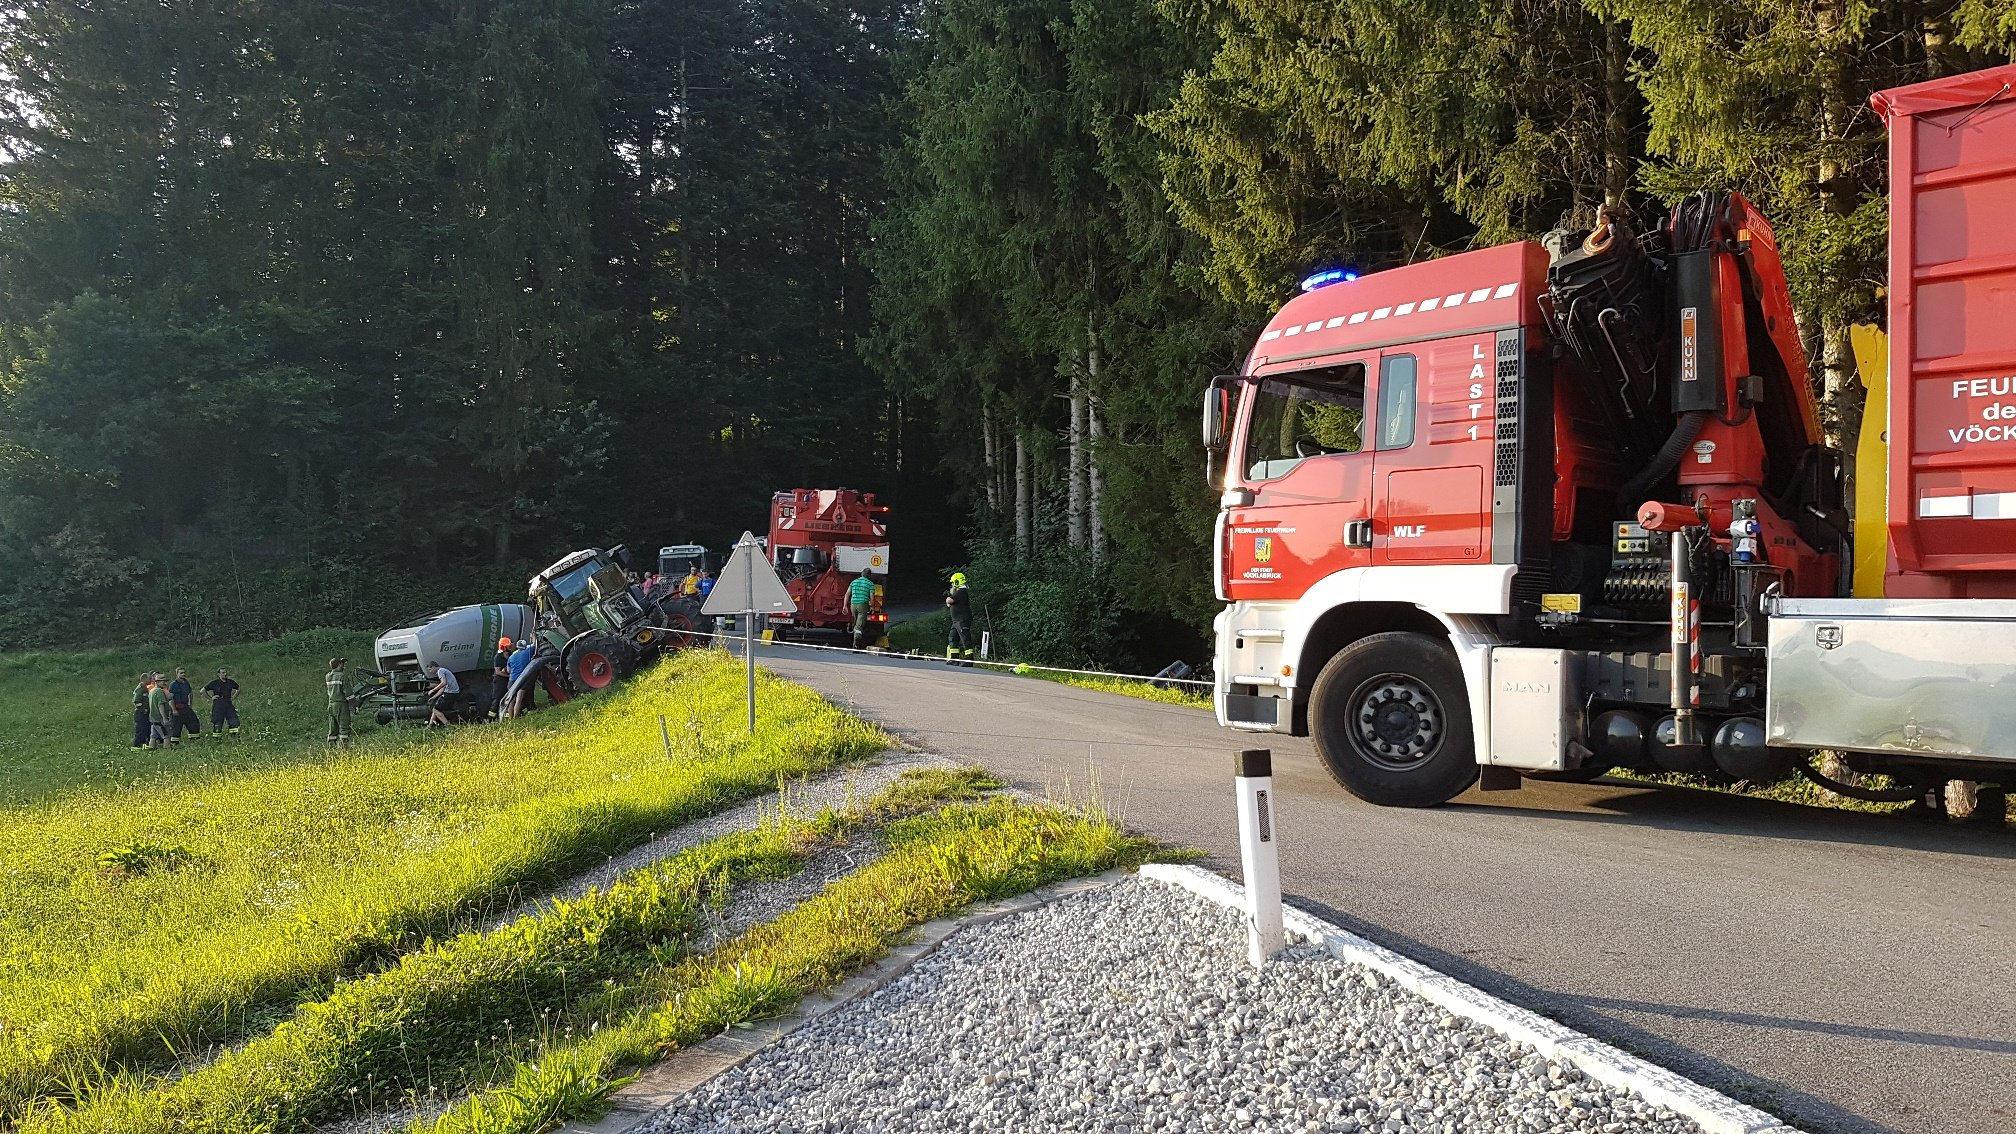 kranpfaffing280819 1 - Traktorbergung Pfaffing